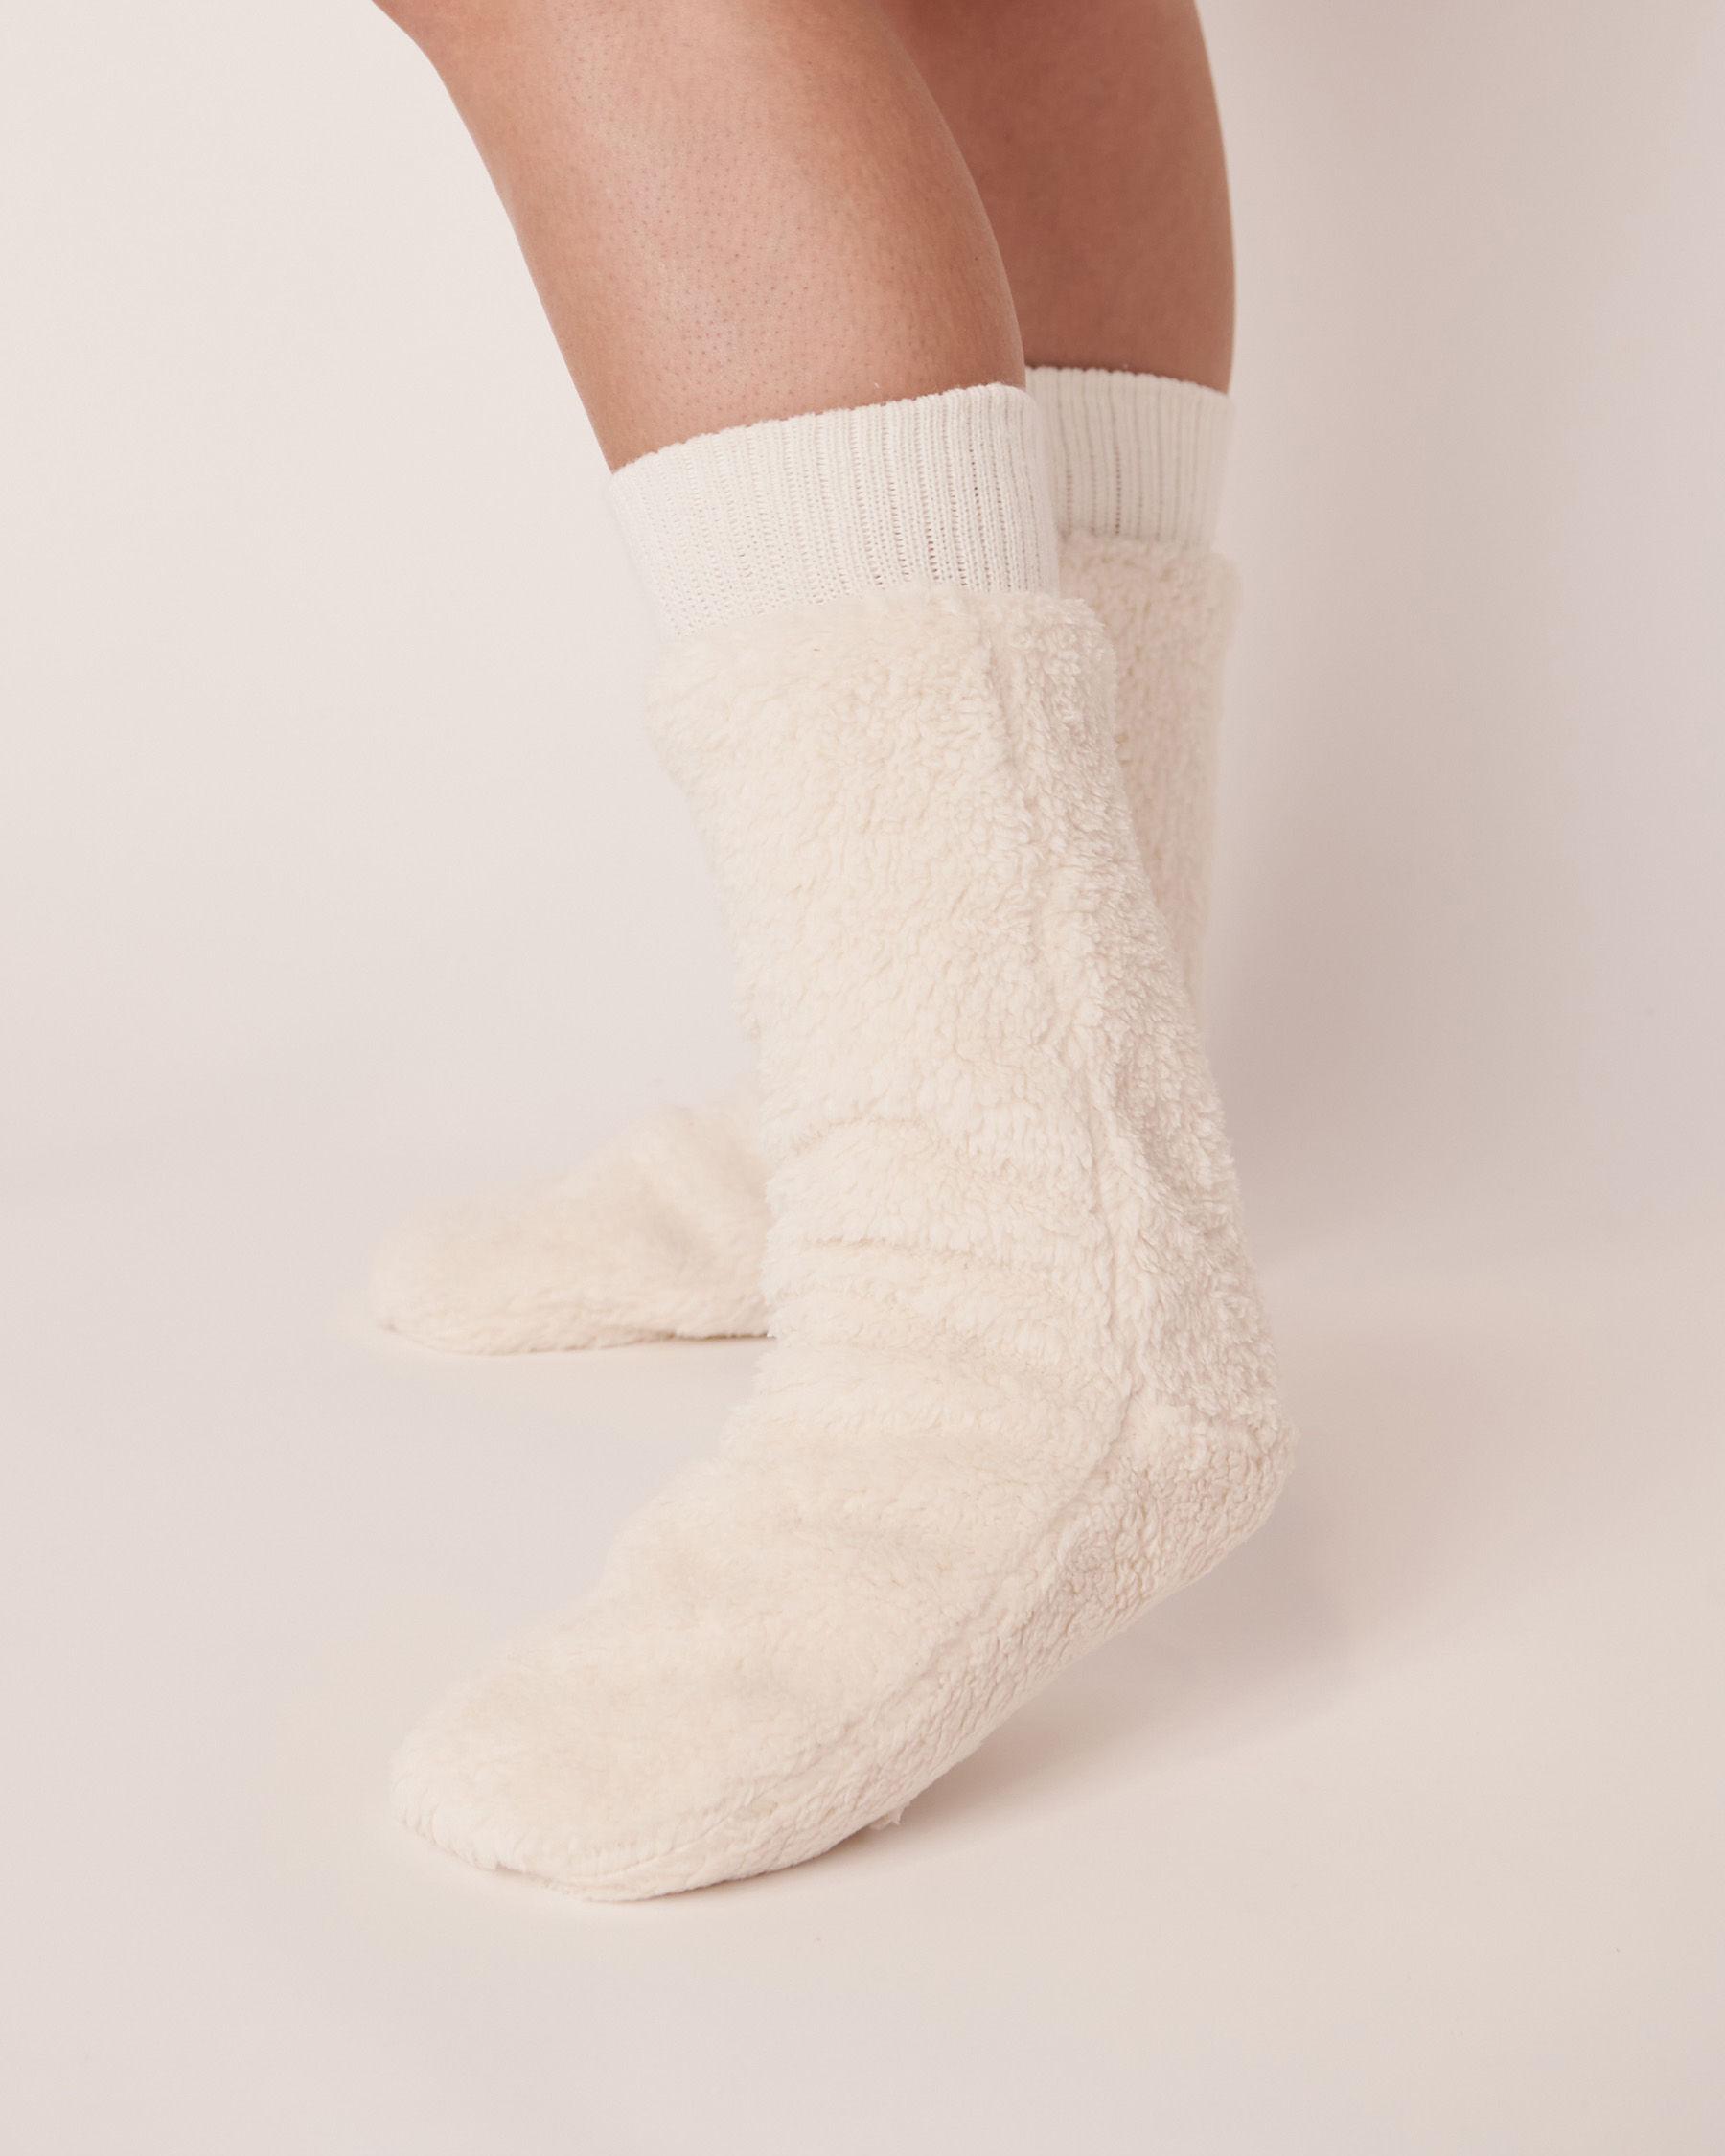 LA VIE EN ROSE Plush Mid Length Socks White 40700050 - View1